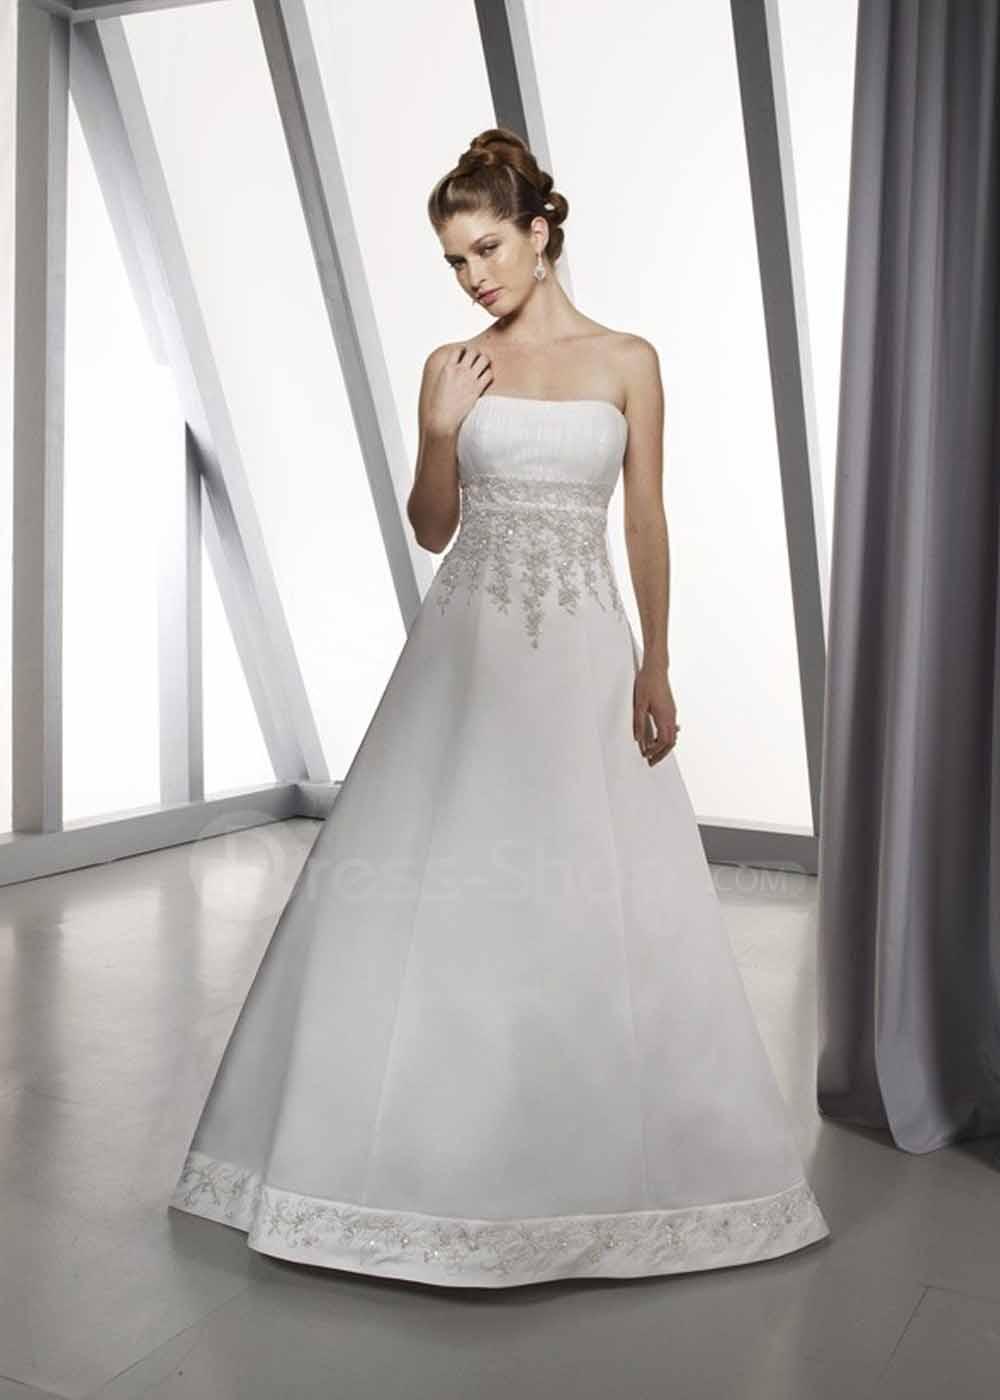 wedding dress for olive skin tone  Elana Walker presents The Art of I DO